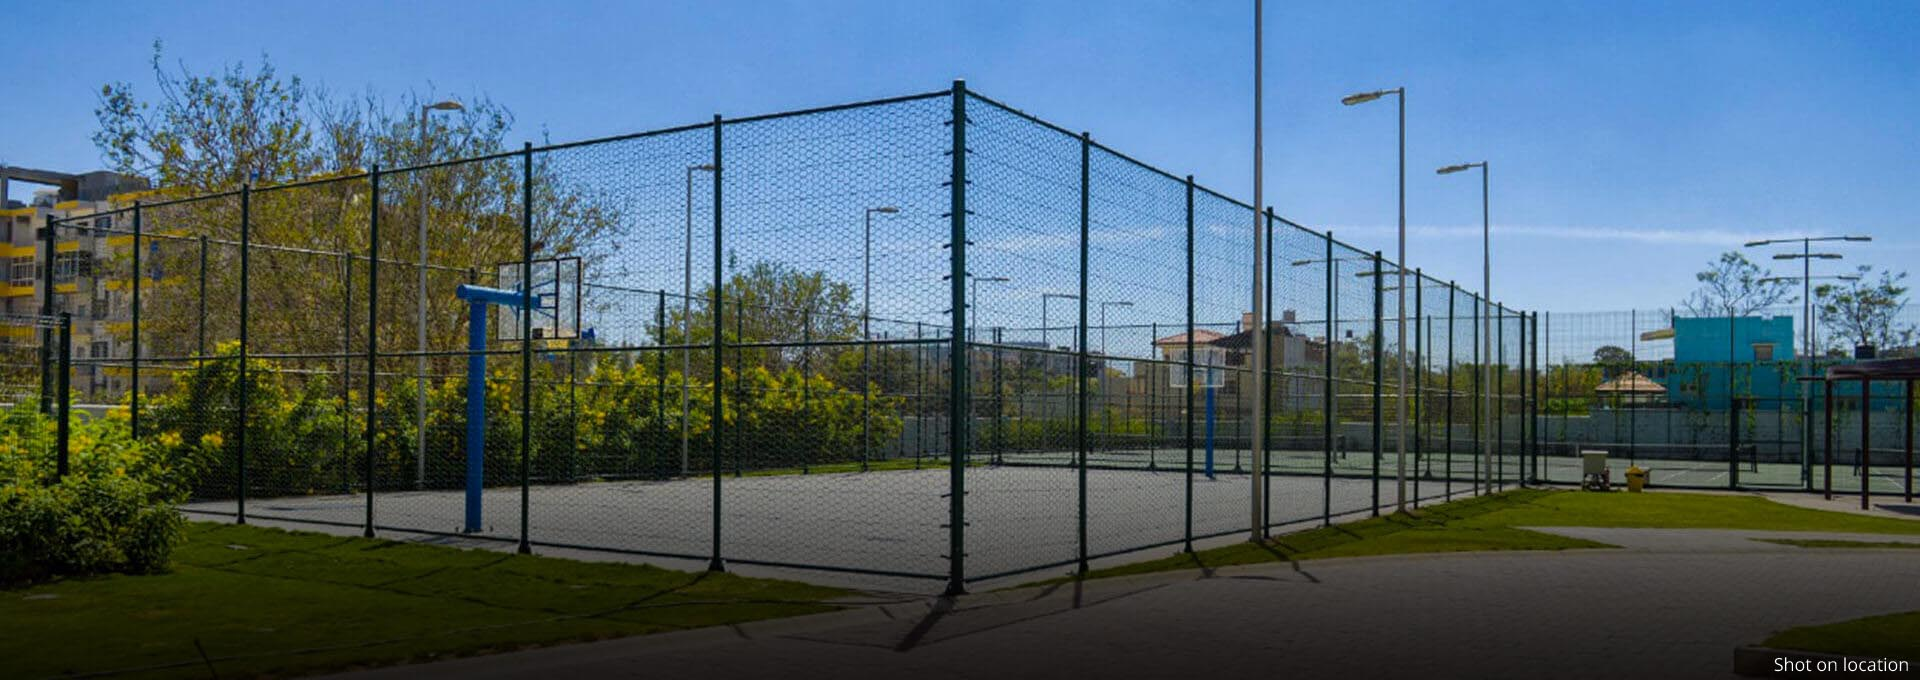 torino bannerghatta basketball